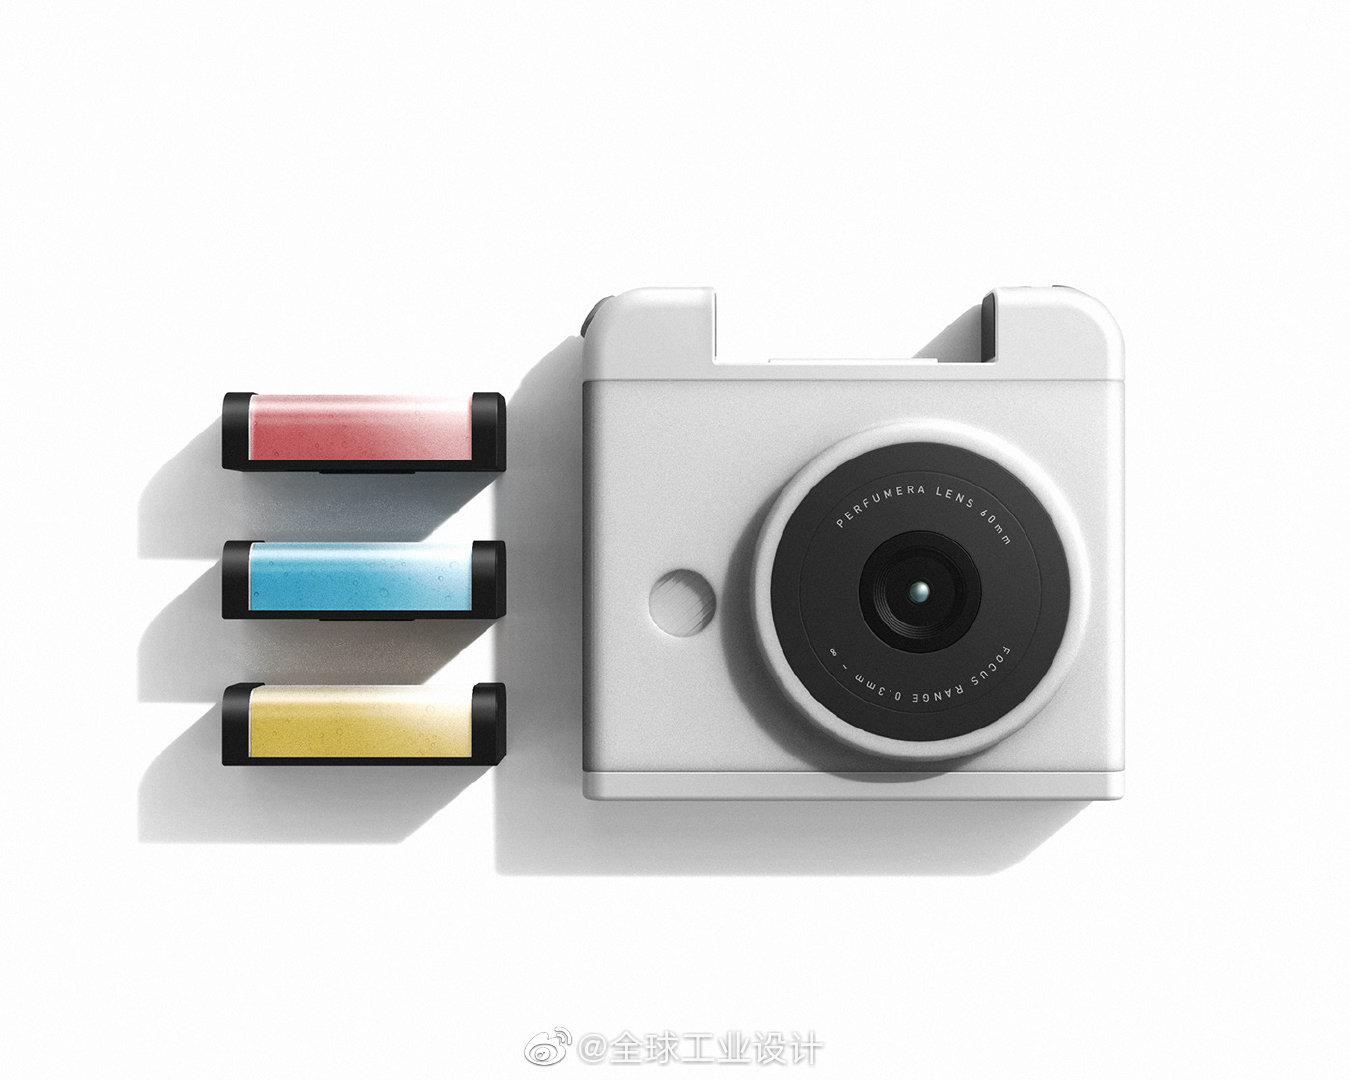 Perfumera 照相机